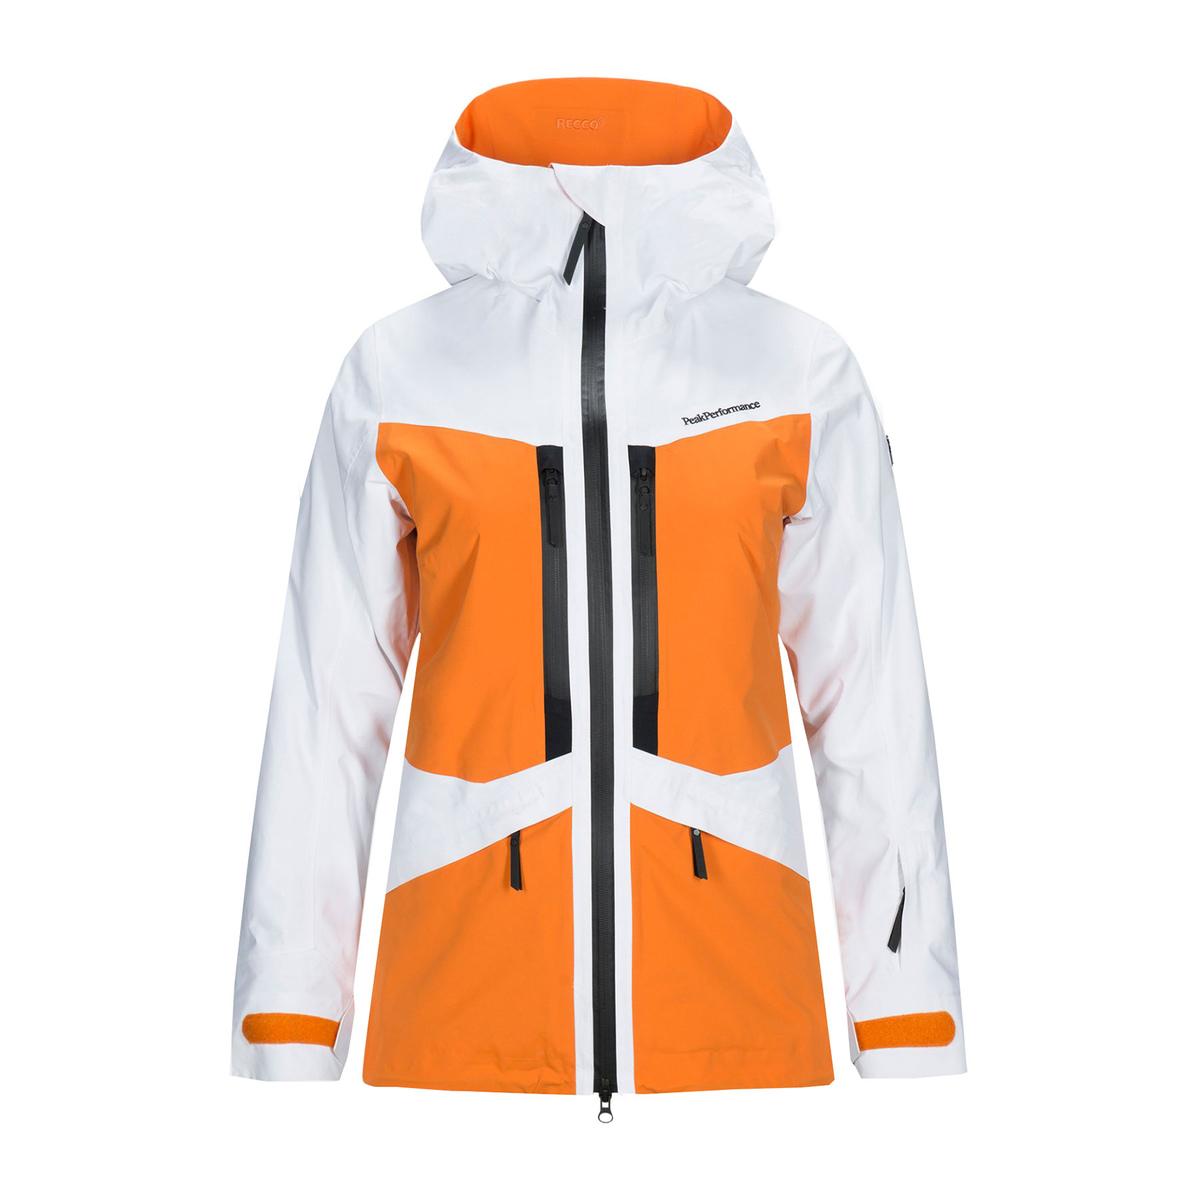 Prezzi Peak performance giacca GRAVITY 2L GORE-TEX DONNA